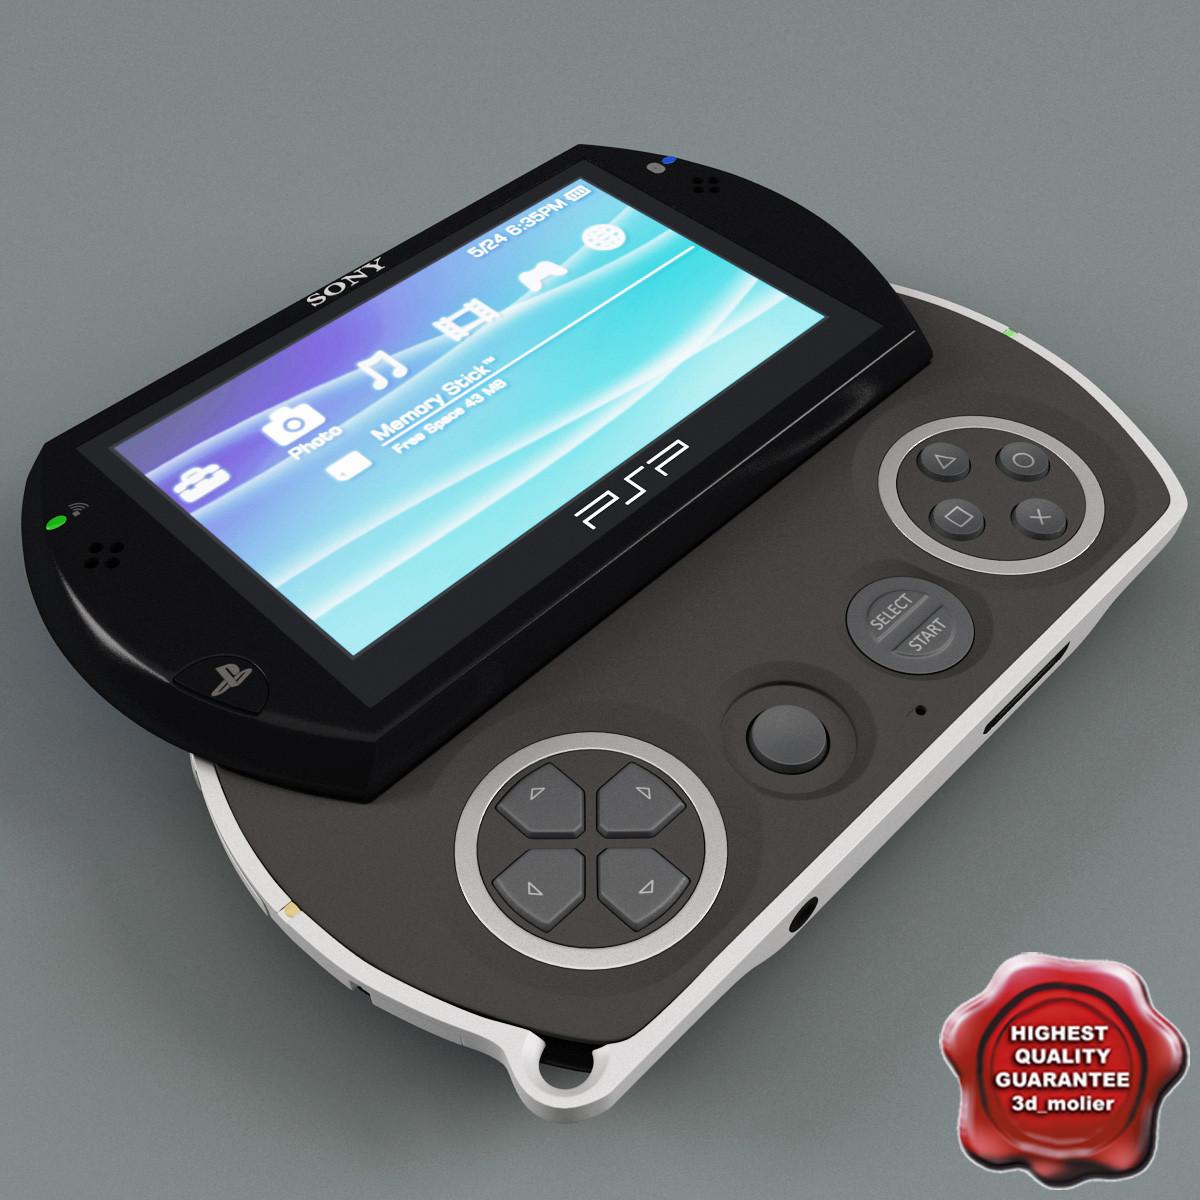 Sony PSP Go N1008 Black